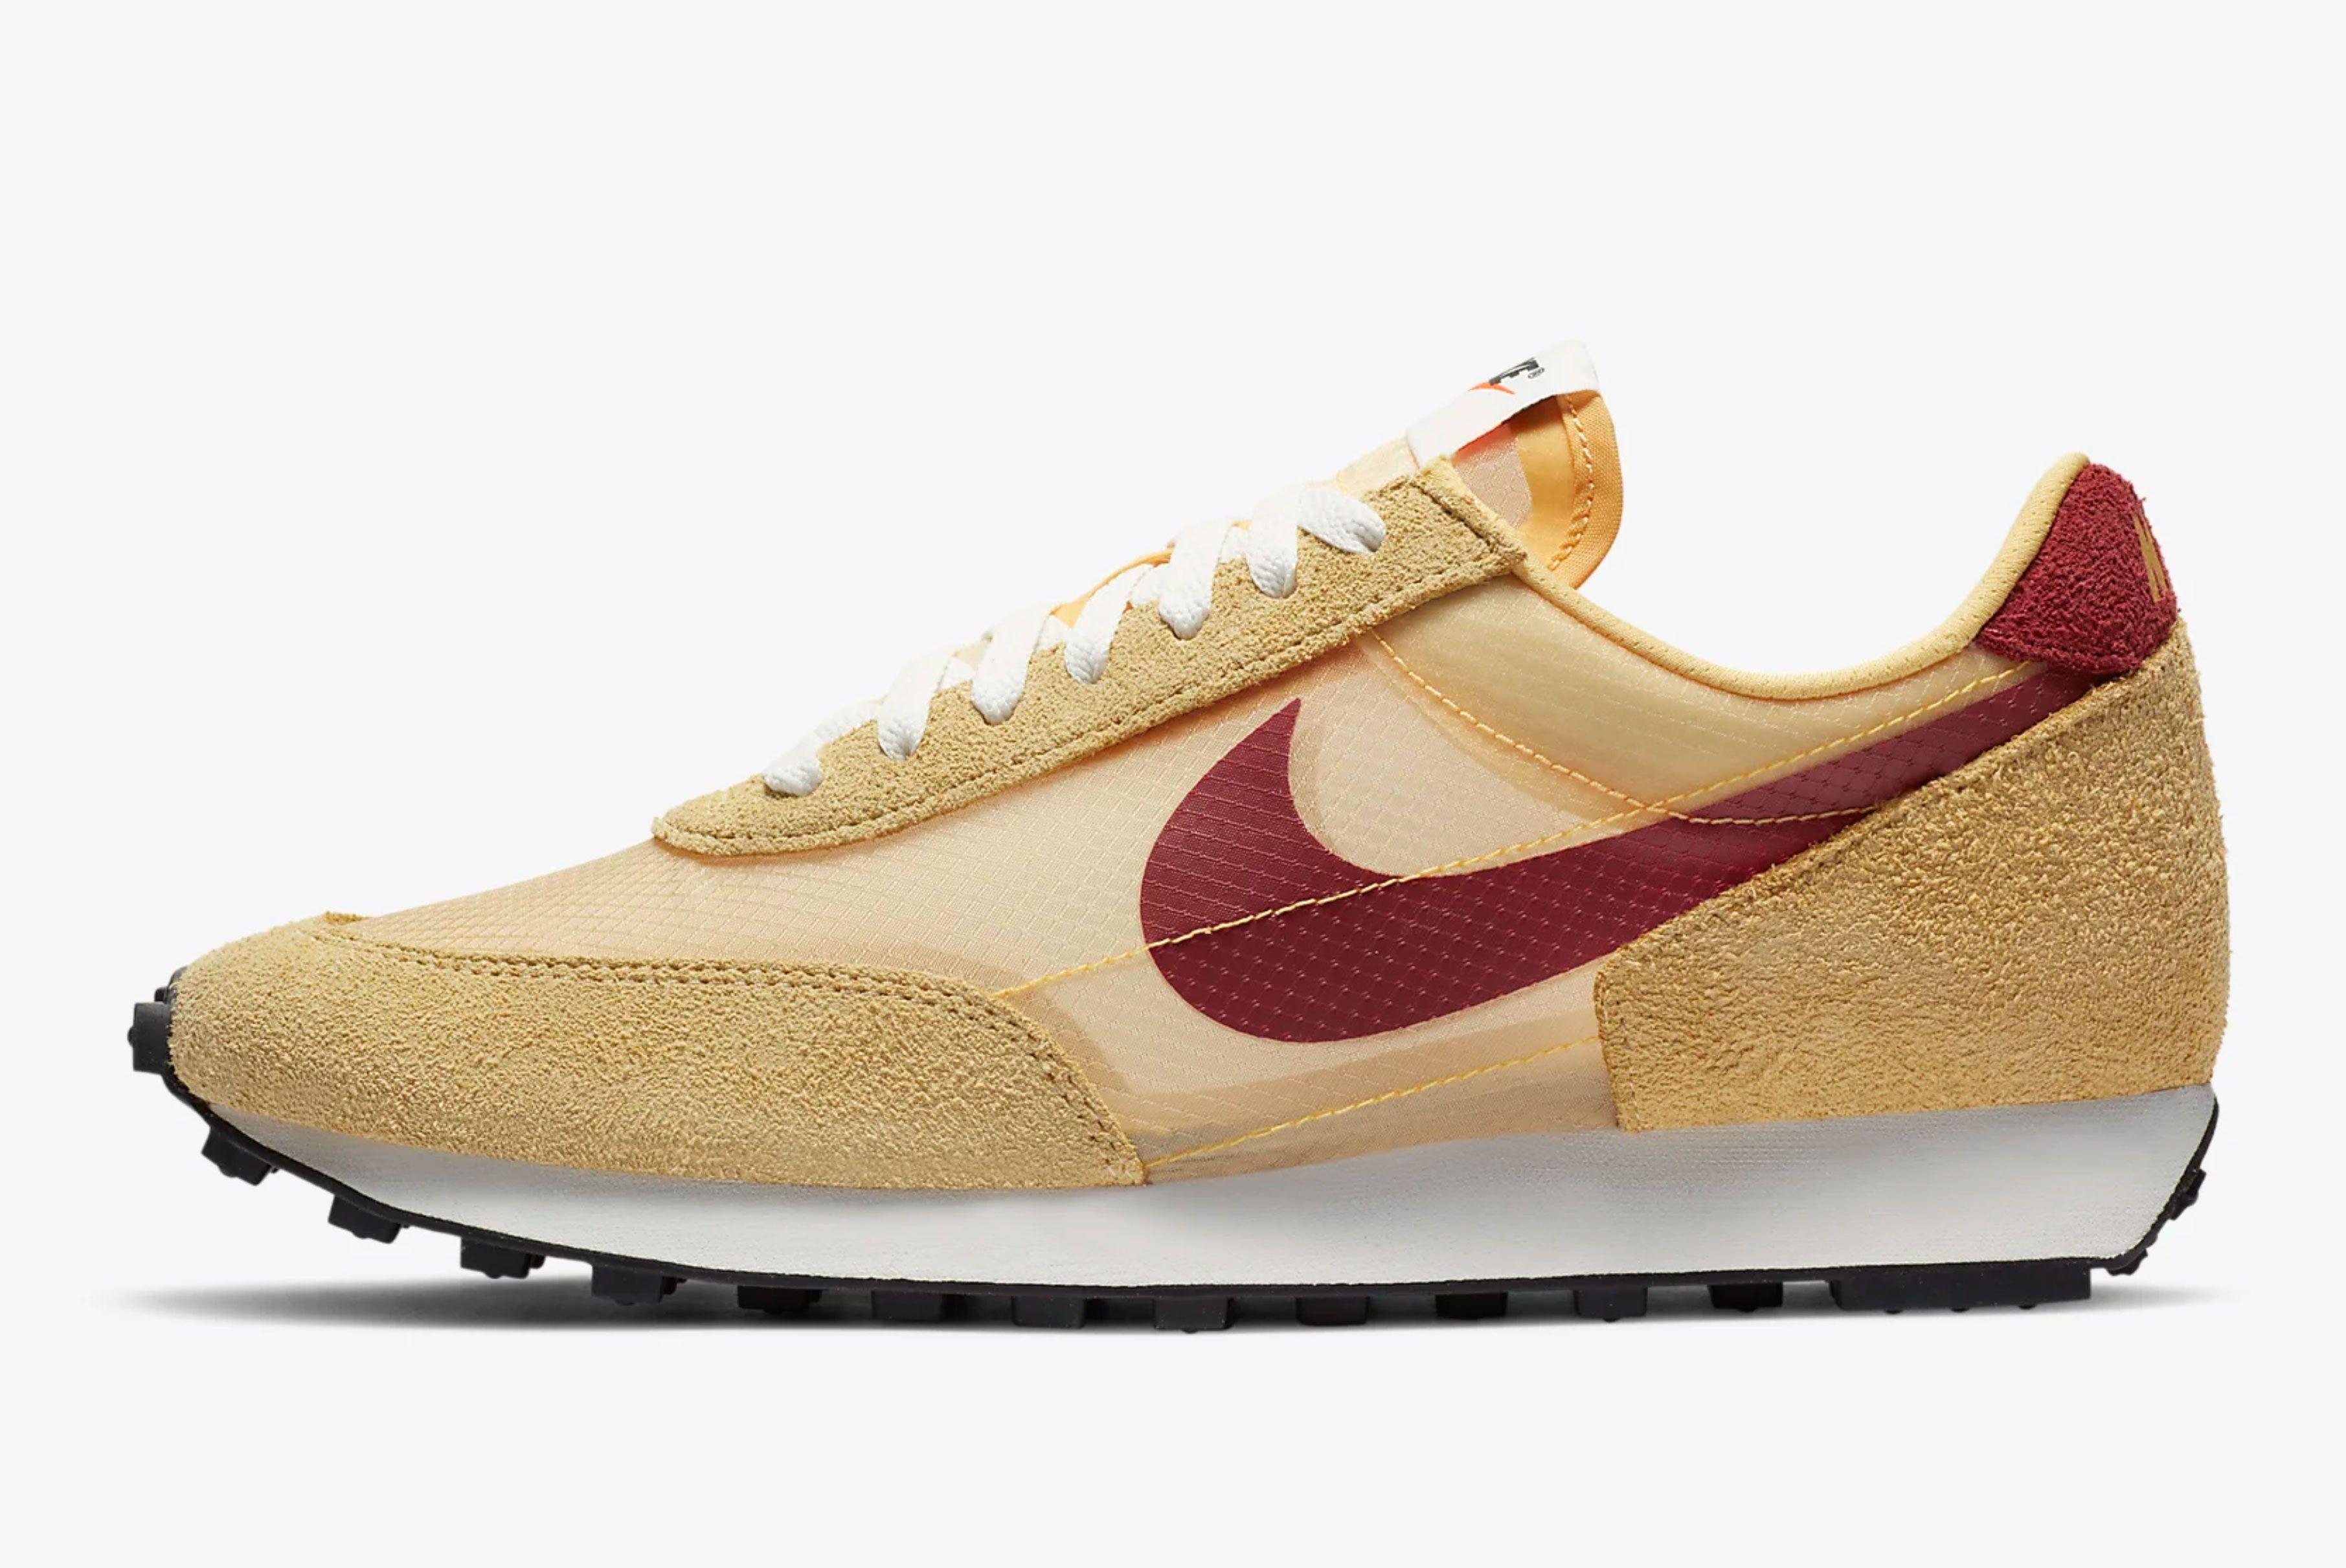 Nike Daybreak 'Topaz Gold/Lemon Wash'